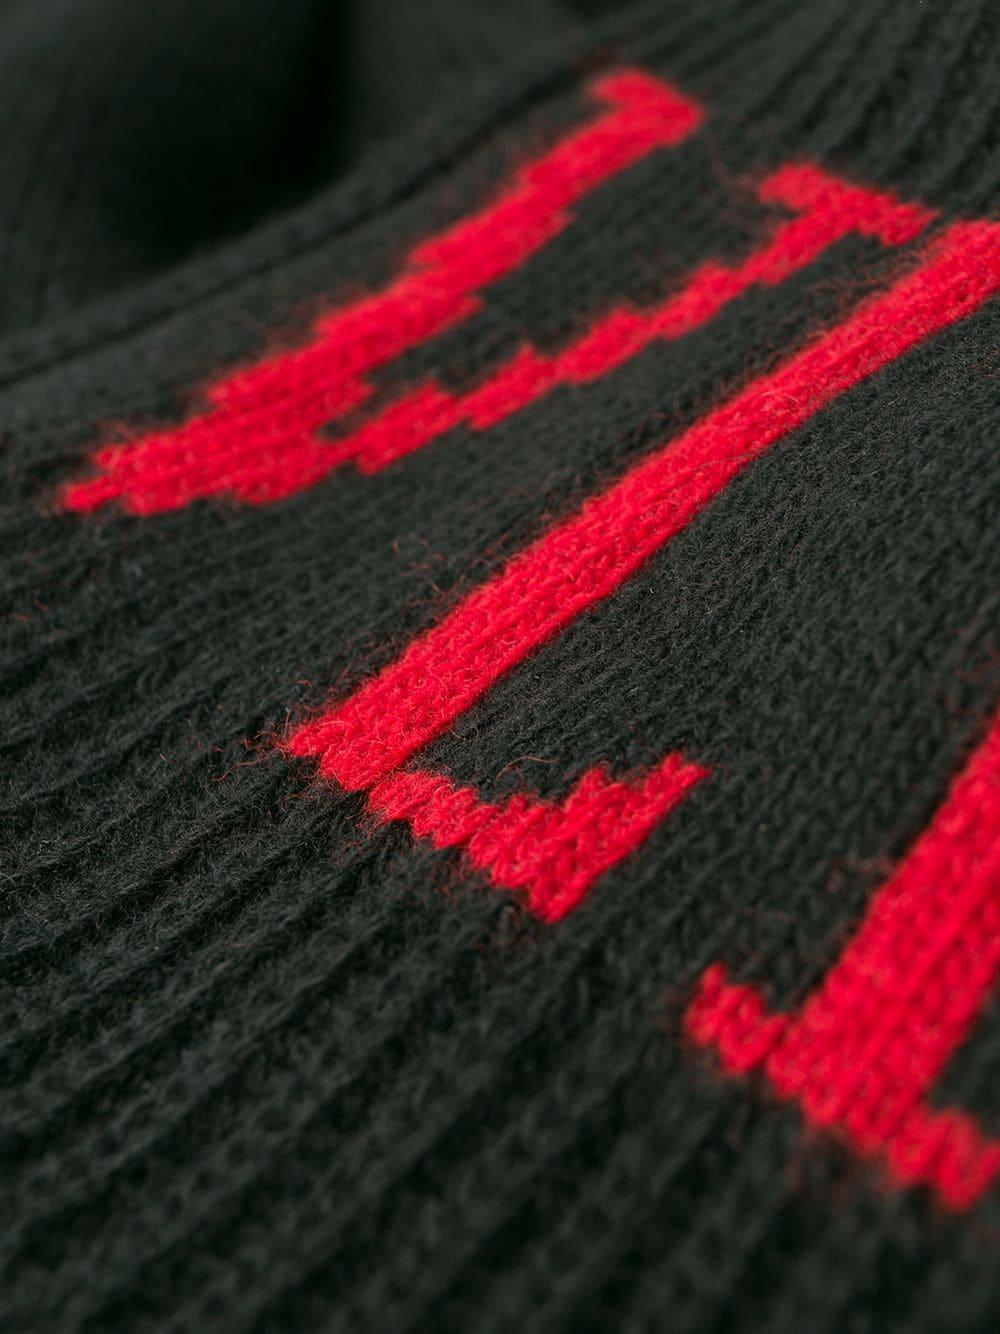 VALENTINO | Valentino свитер жаккардовой вязки с логотипом VLTN | Clouty